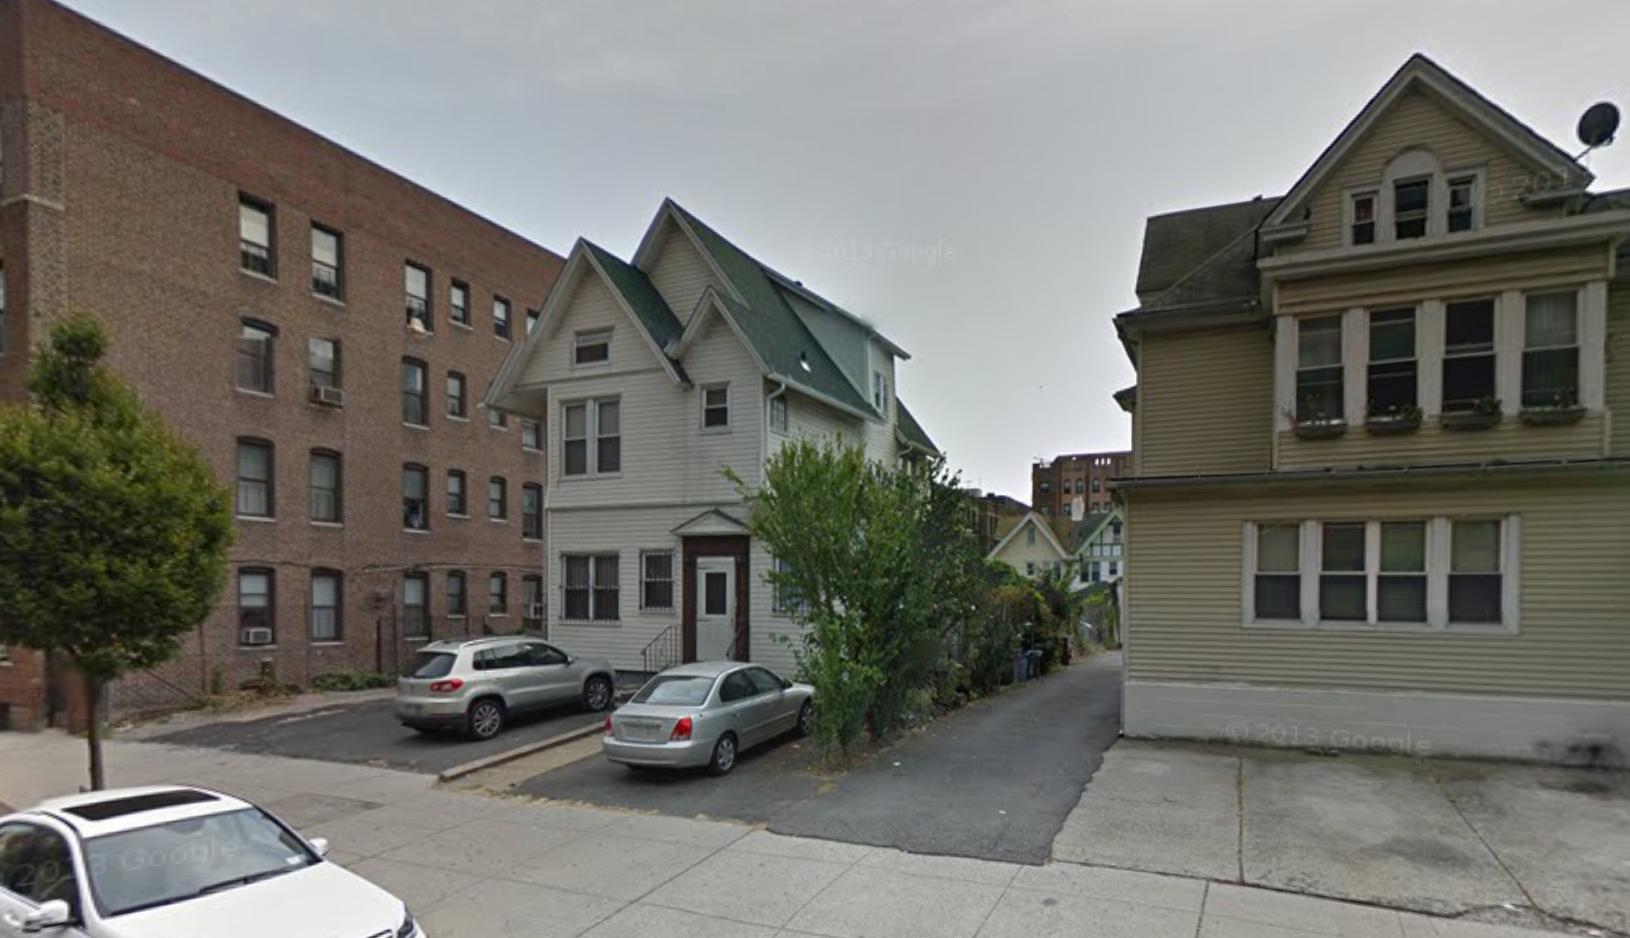 148-36 89th Avenue, image via Google Maps